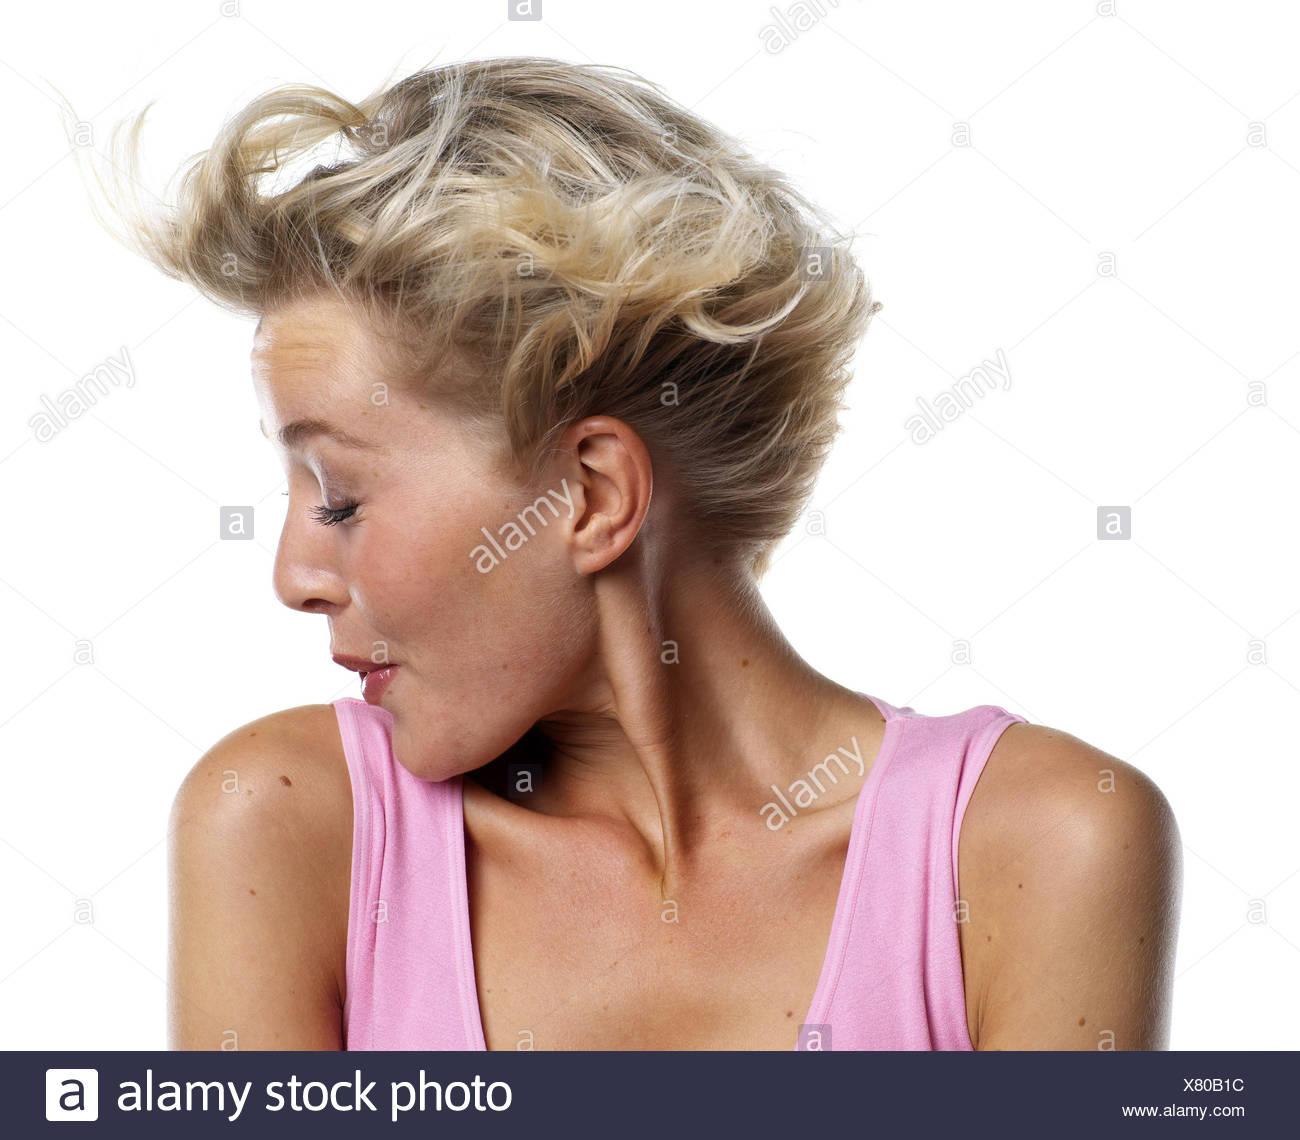 Eva mendez nude video